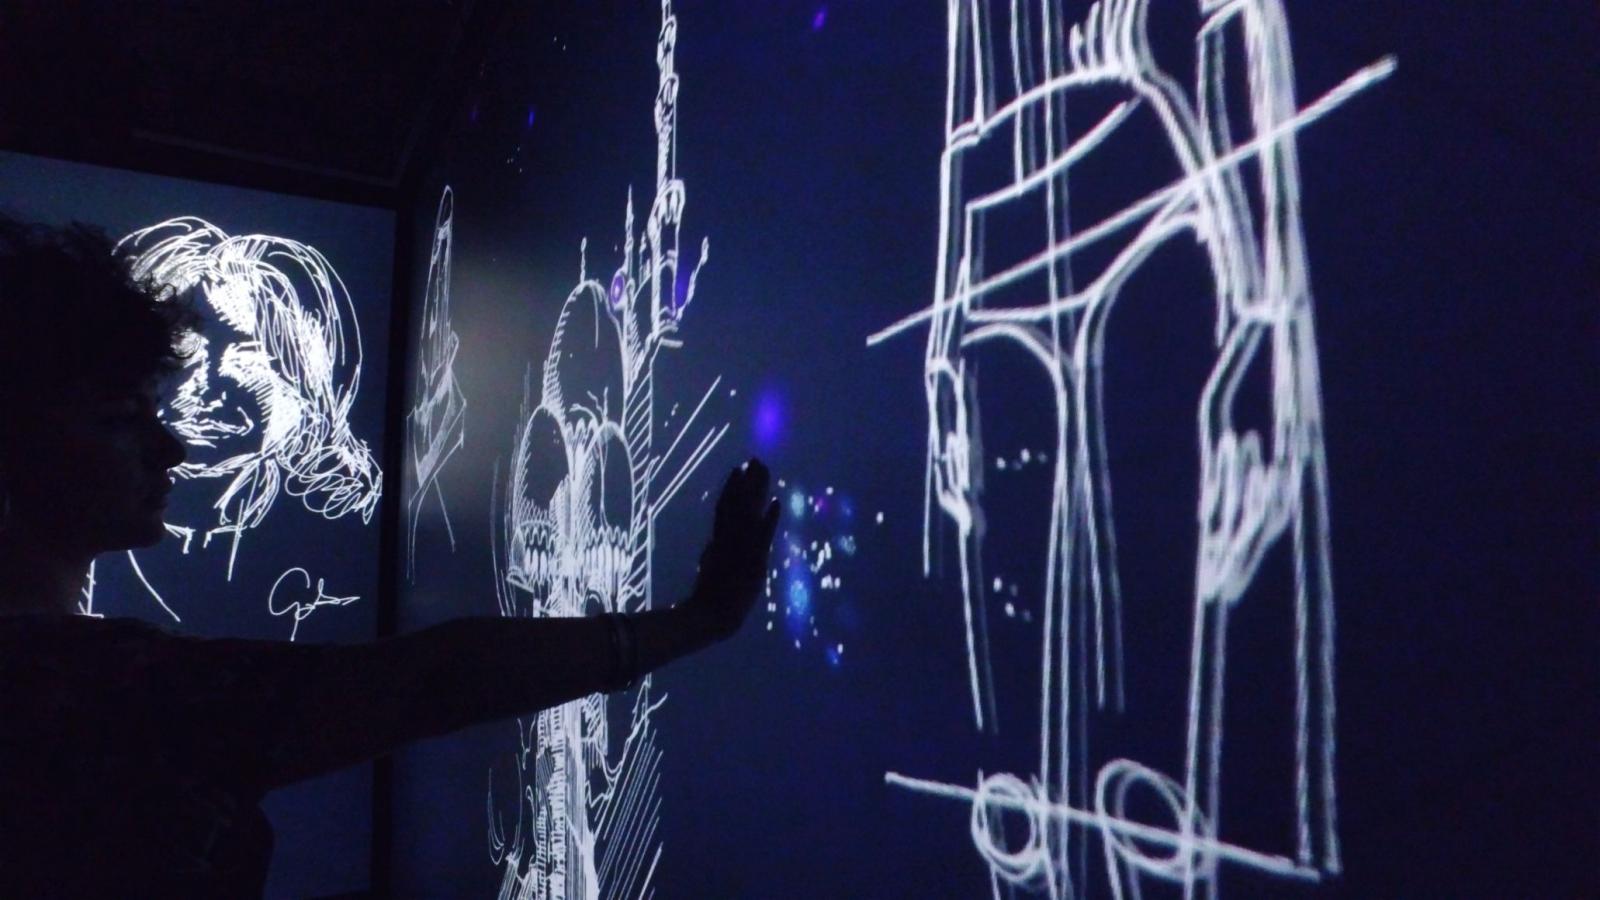 Milano Design Week: l'esperienza immersiva di Moleskine e Souldesigner thumbnail